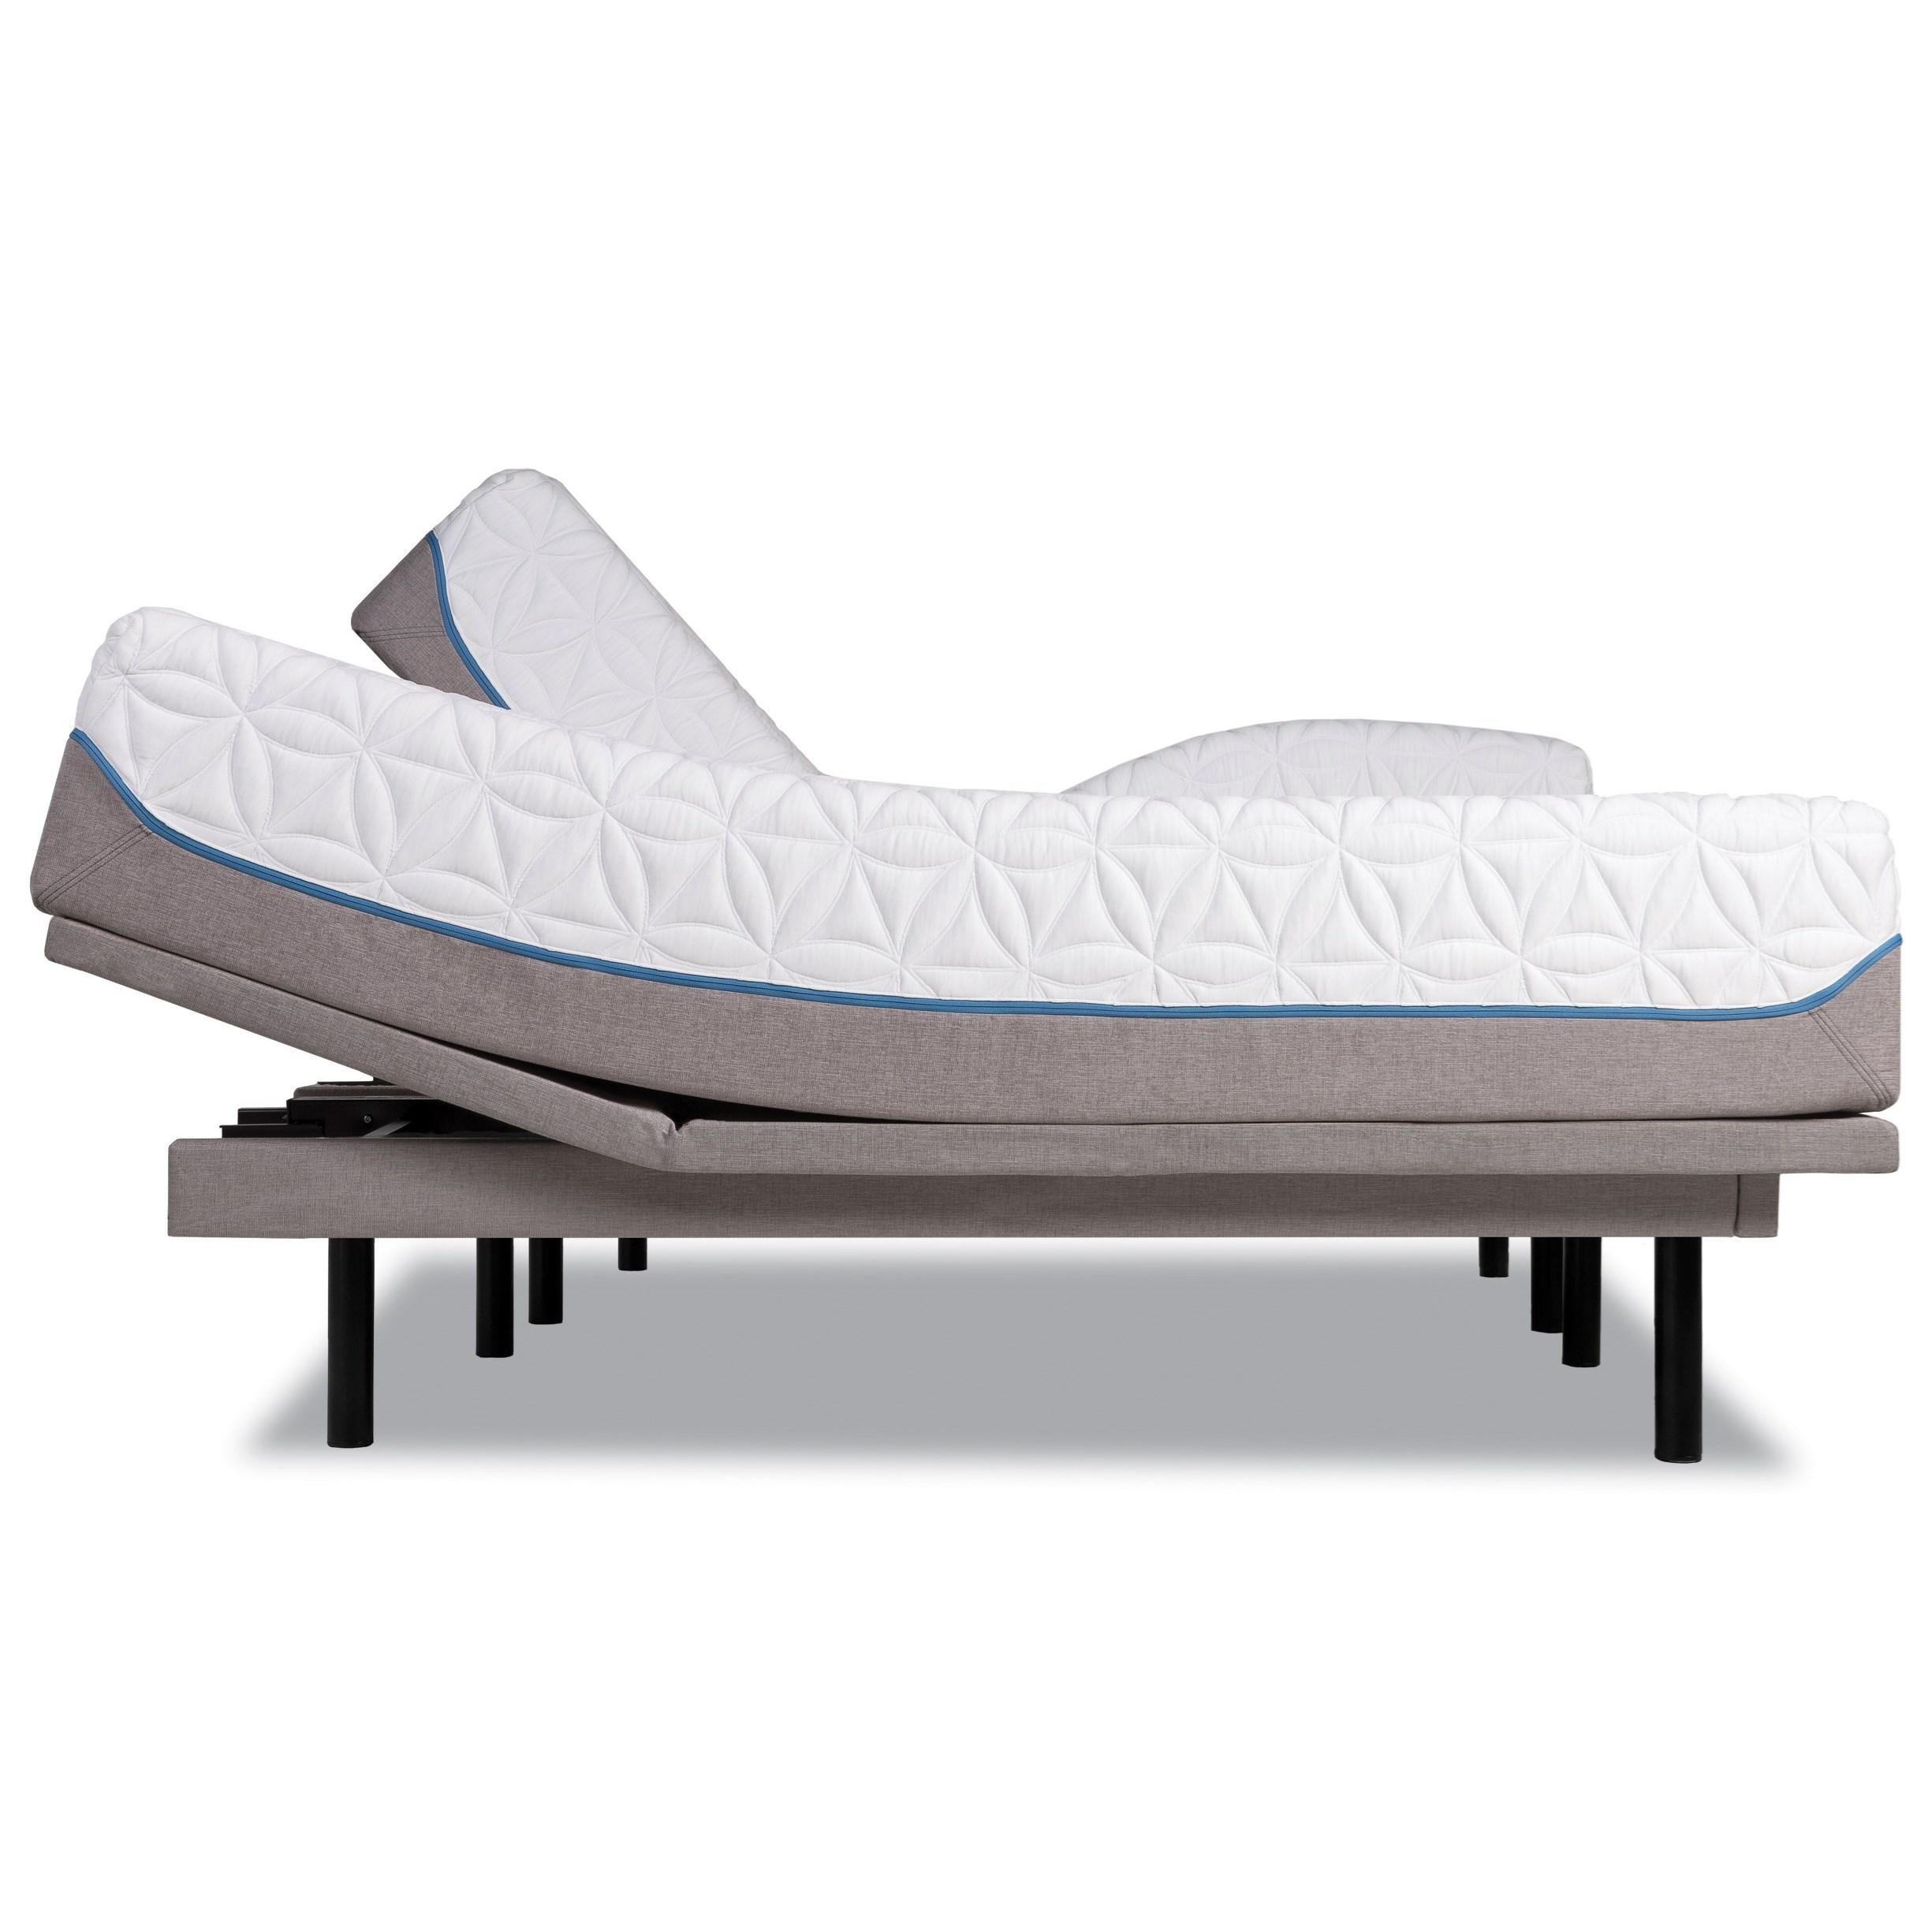 Tempur-Pedic® TEMPUR-Cloud Luxe Cal King Ultra-Soft Mattress Set - Item Number: 10245280+2x25289290